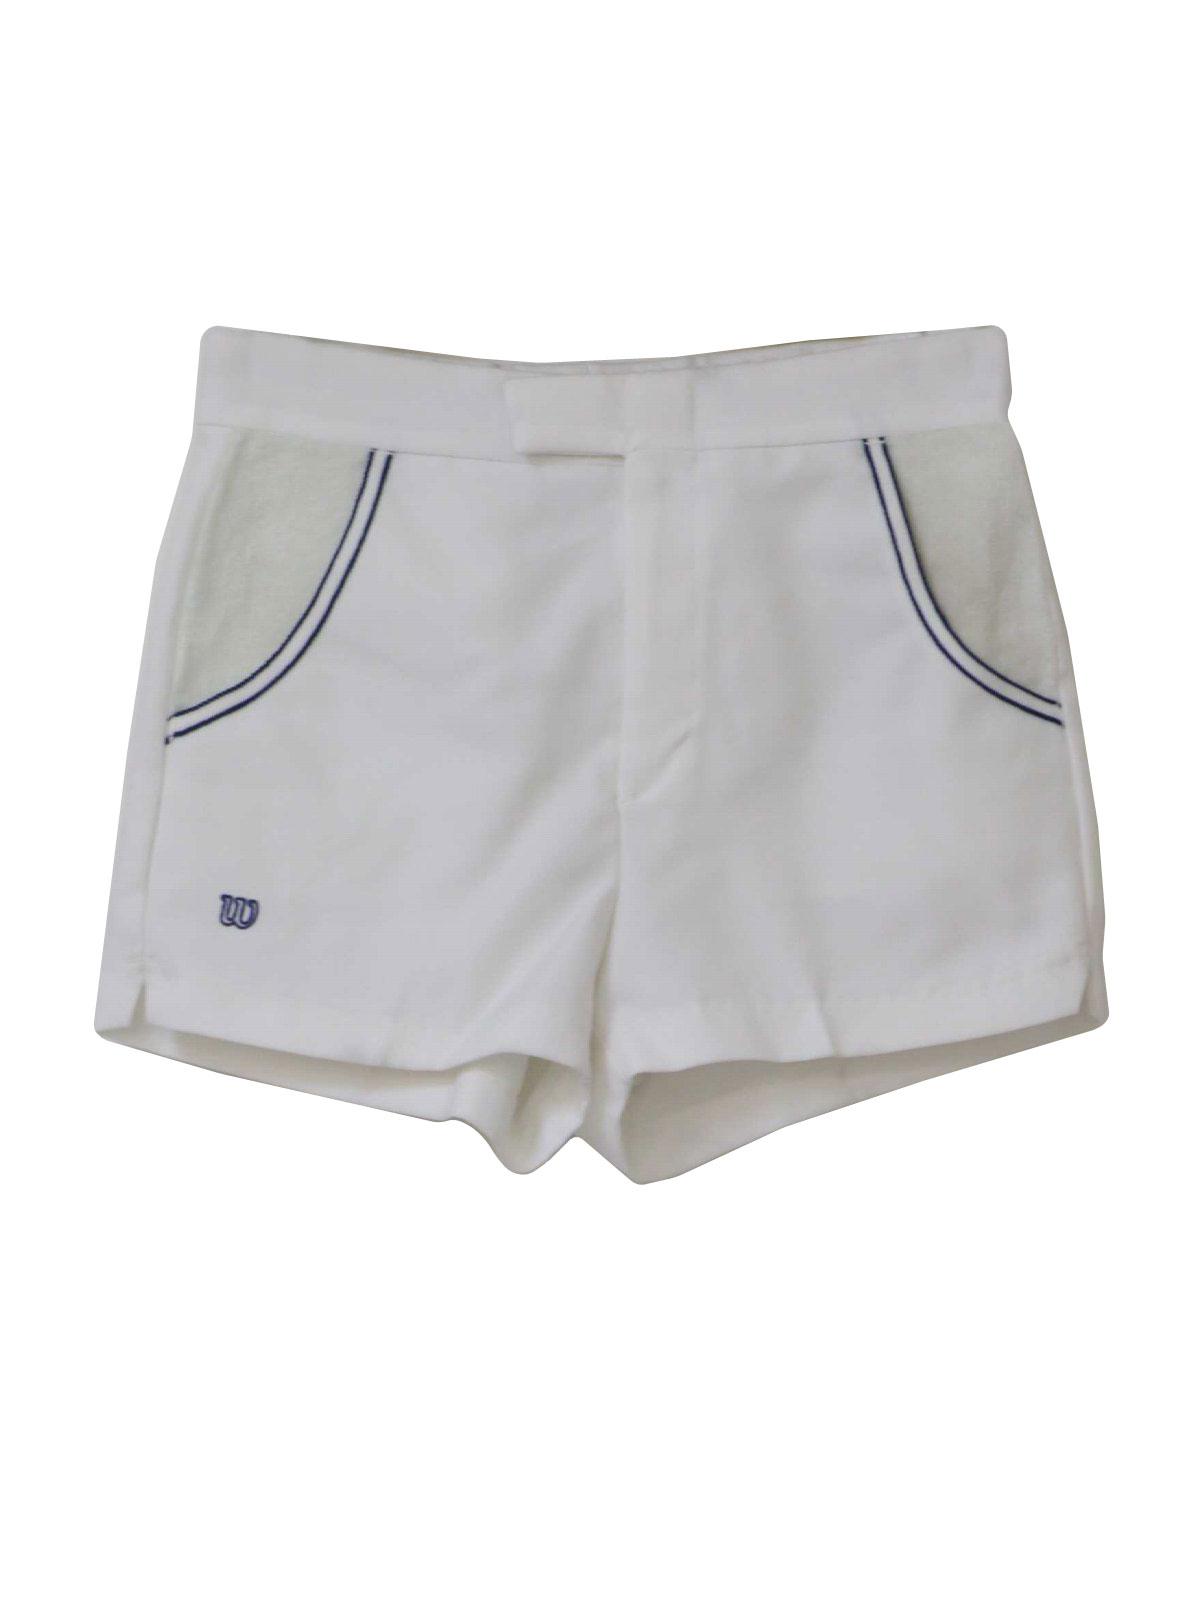 80s Vintage Wilson Tennis Apparel Shorts 80s Wilson